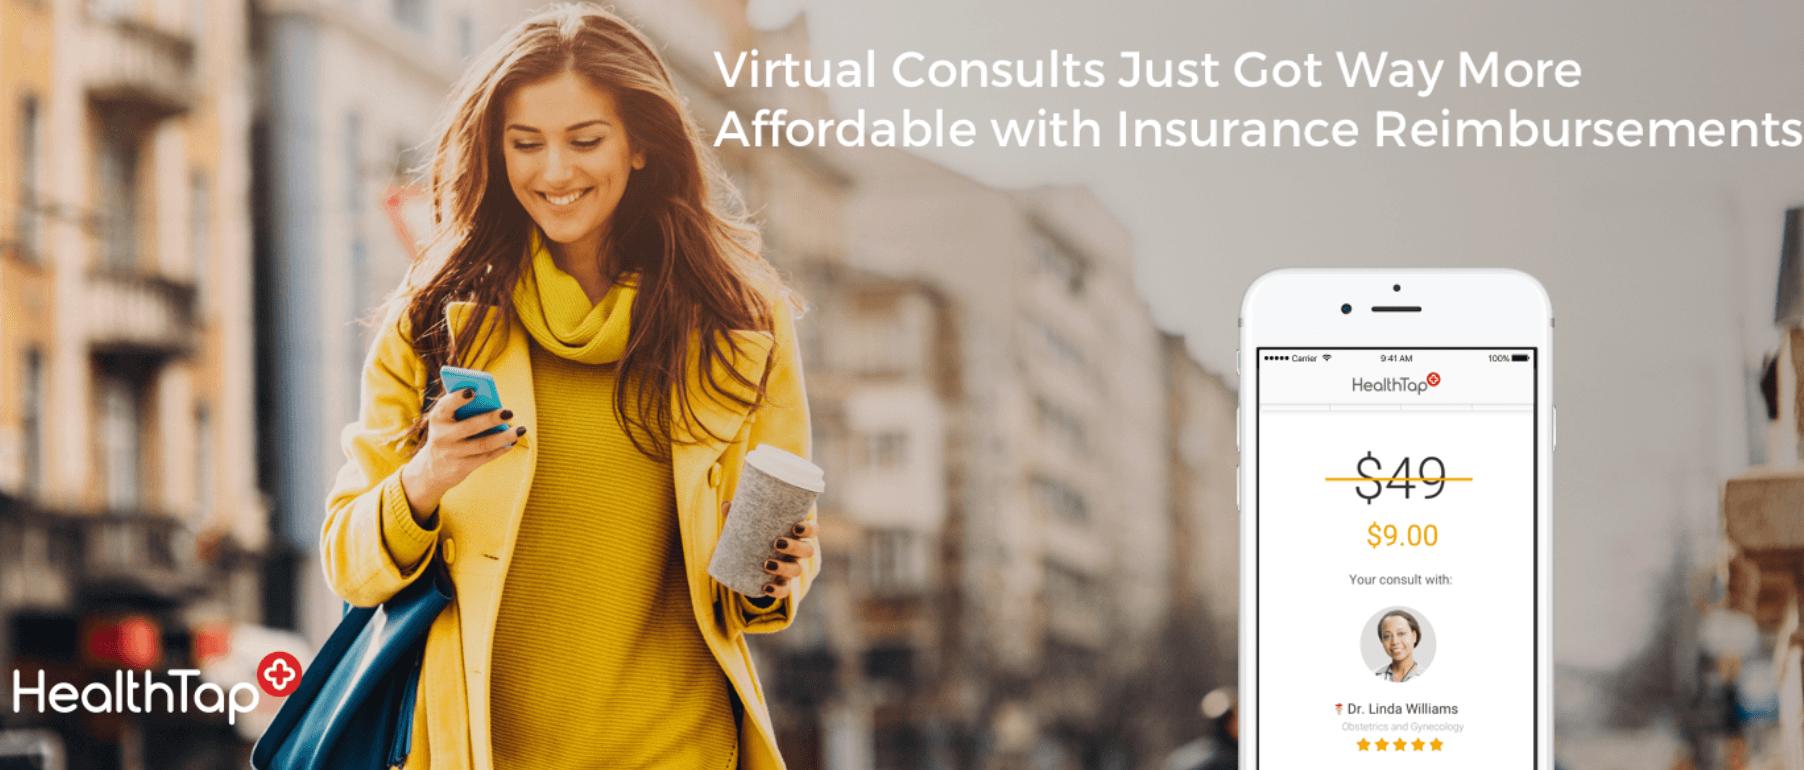 healthtap-virtual-consults